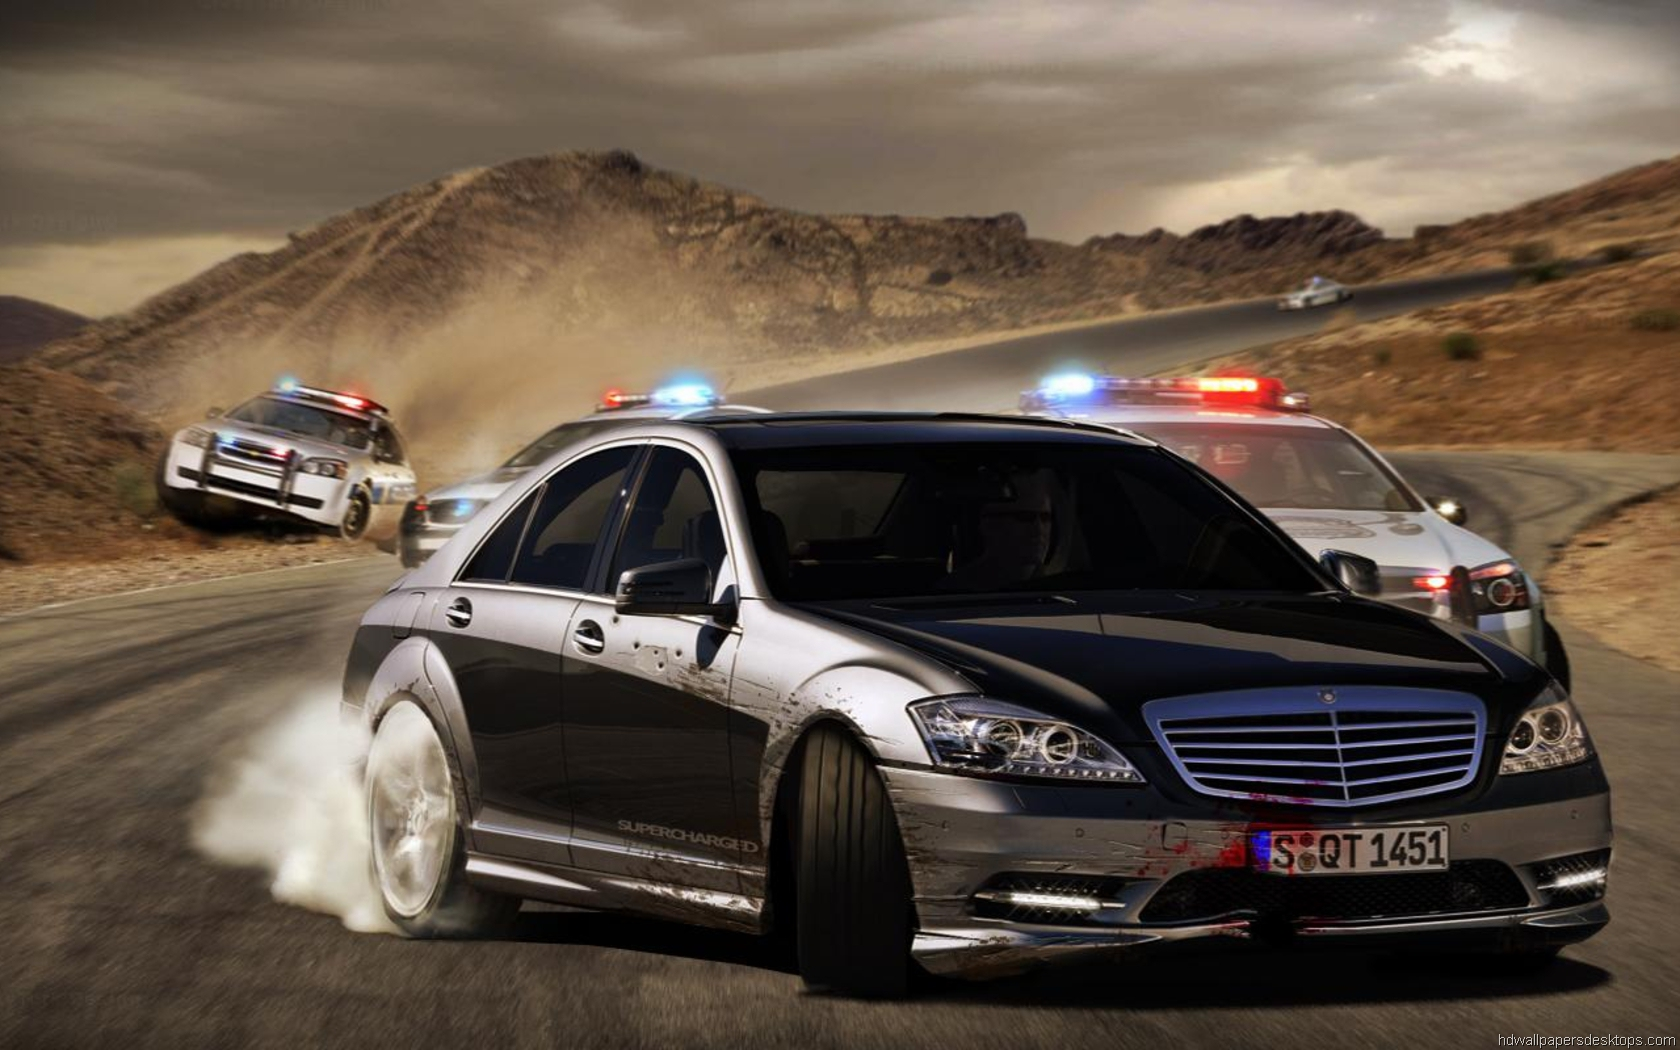 Cars Wallpapers HD Full HD 1080p Desktop Backgrounds 1680x1050 1680x1050